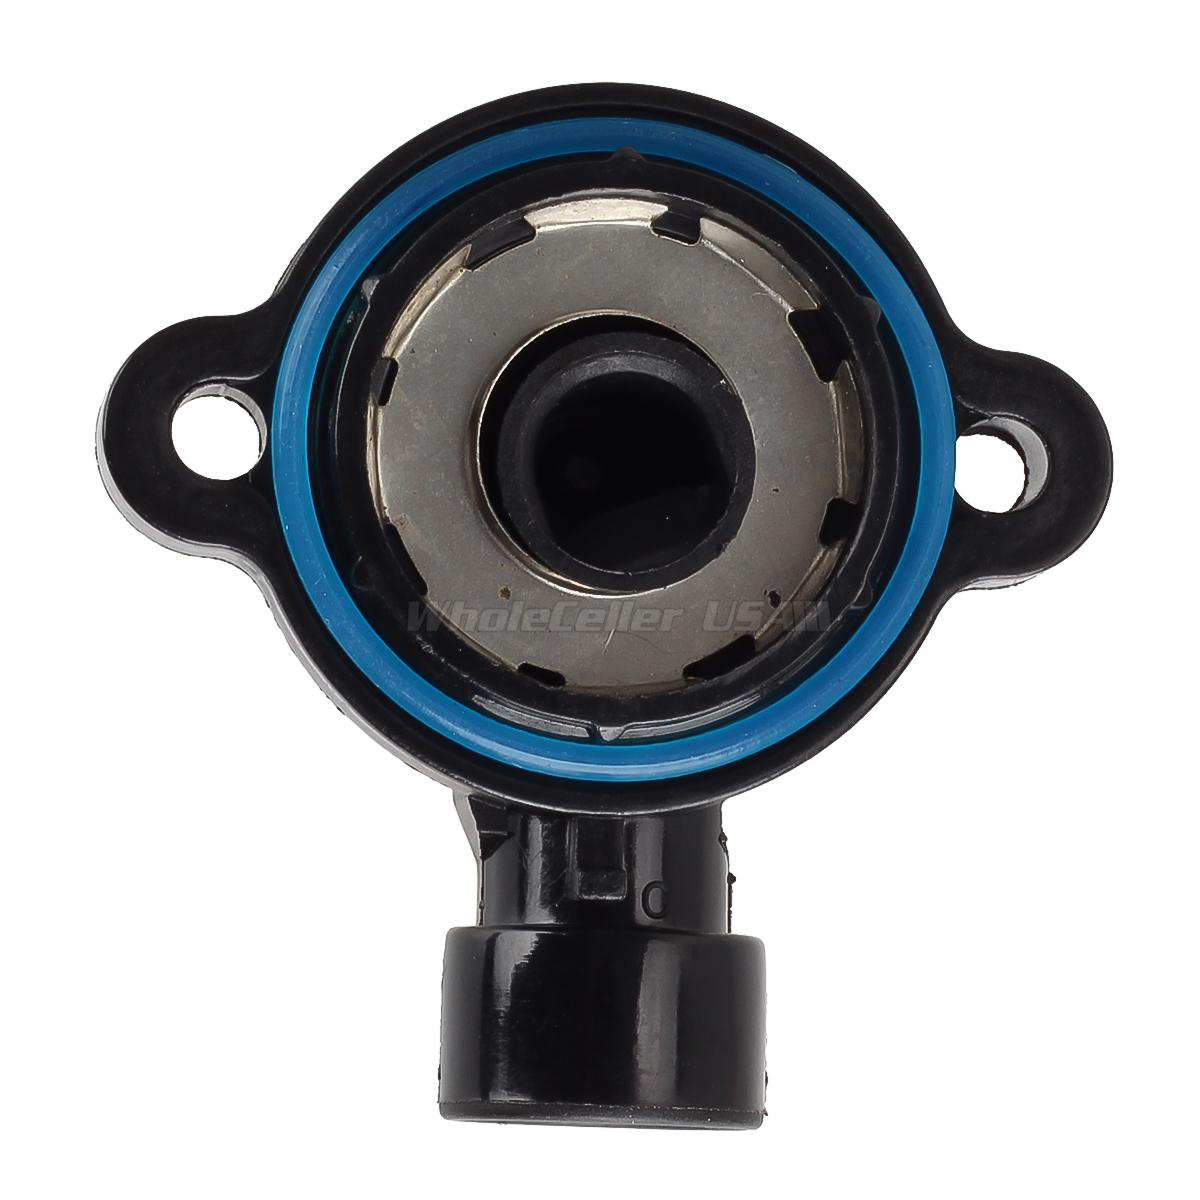 Th149 Throttle Position Sensor For 96 04 Gmc Safari Sonoma